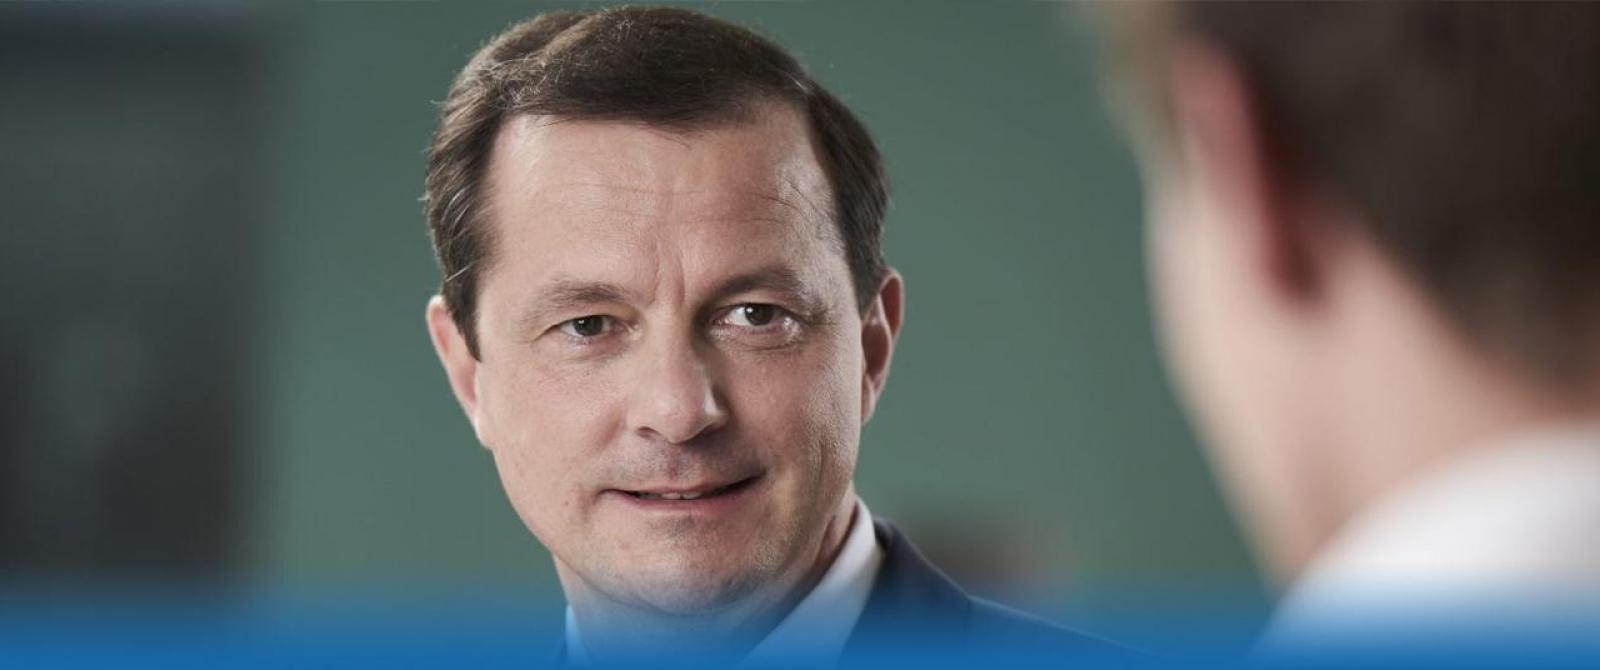 oliver-grundmann-stade-rotenburg-politiker-cdu-berlin-bundestag-mdb (63)